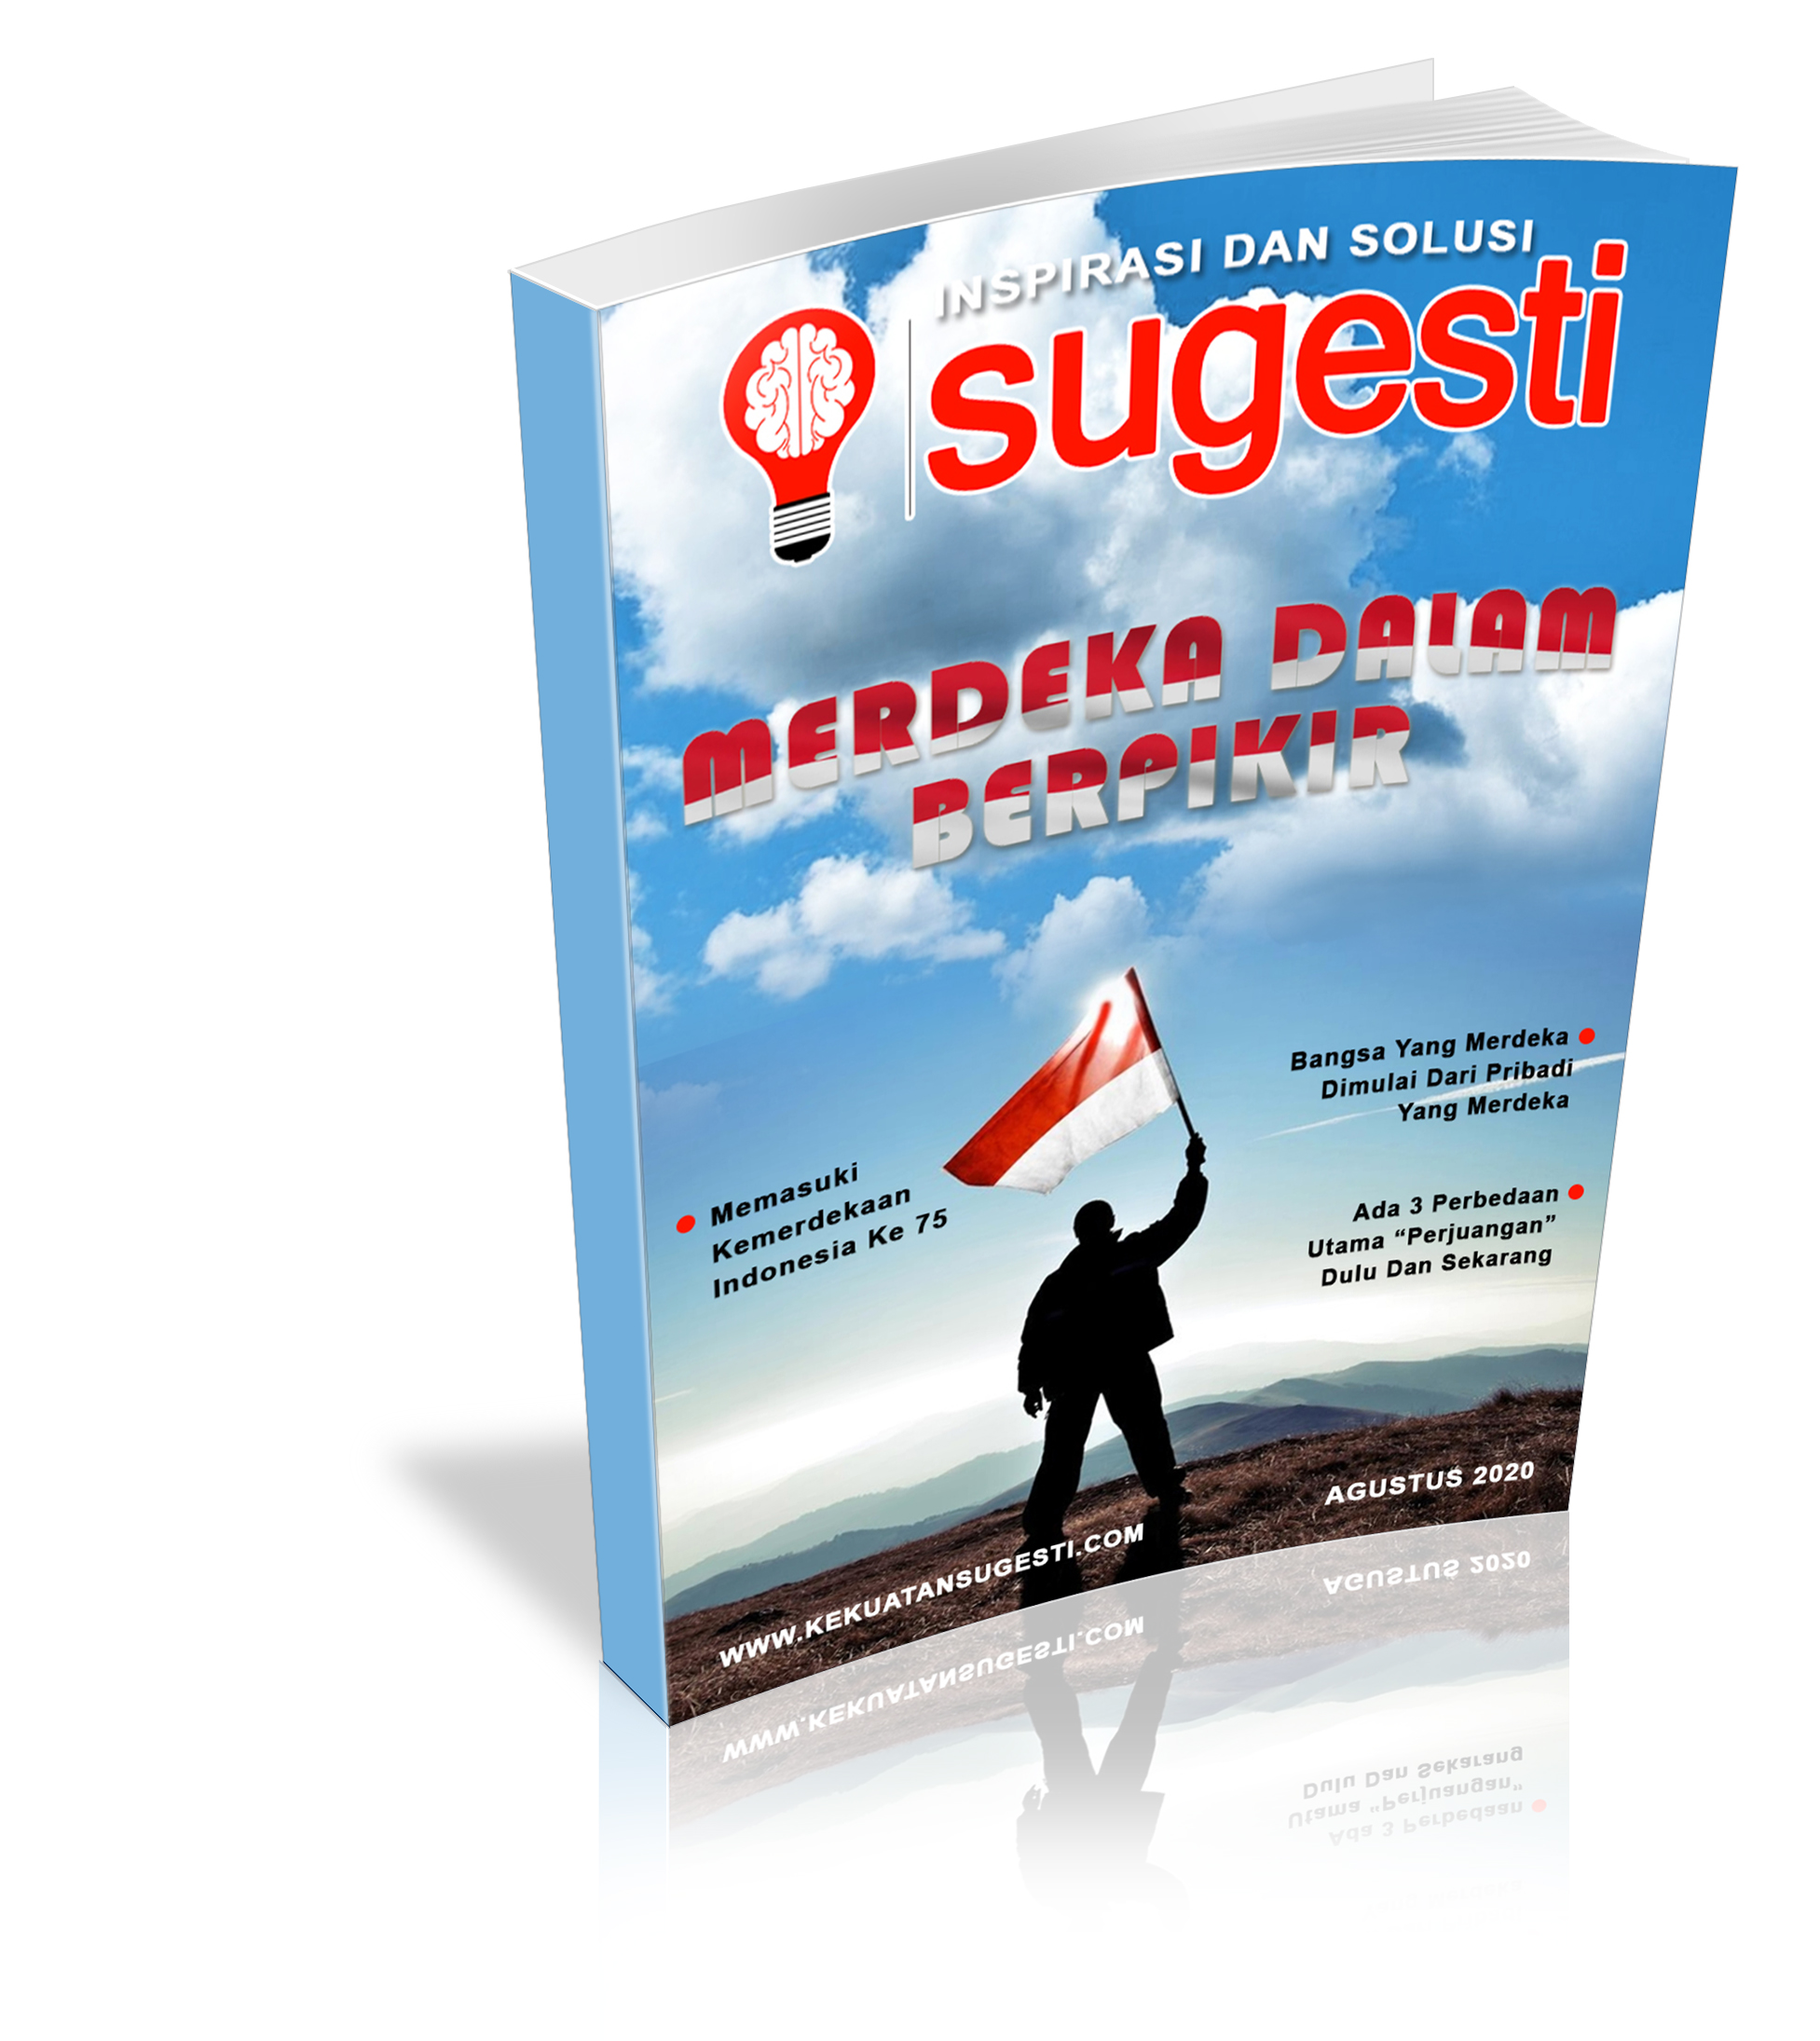 Majalah Sugesti Edisi Ke Tujuh Puluh Empat Bulan Agustus 2020